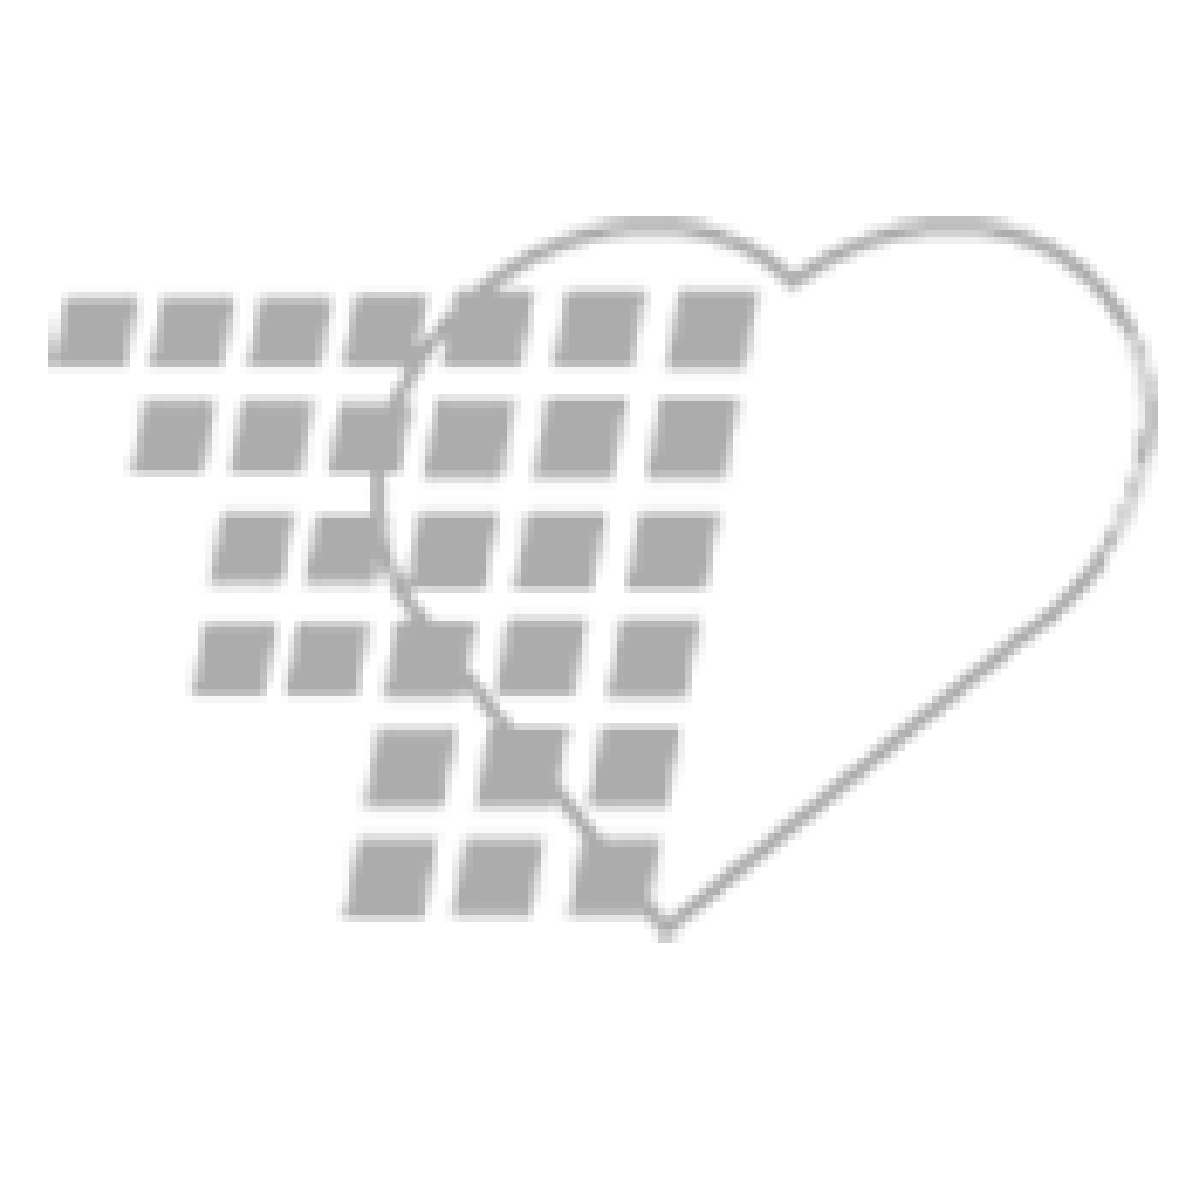 05-01-2361 Elastic Bandages Non-Sterile, Latex Free